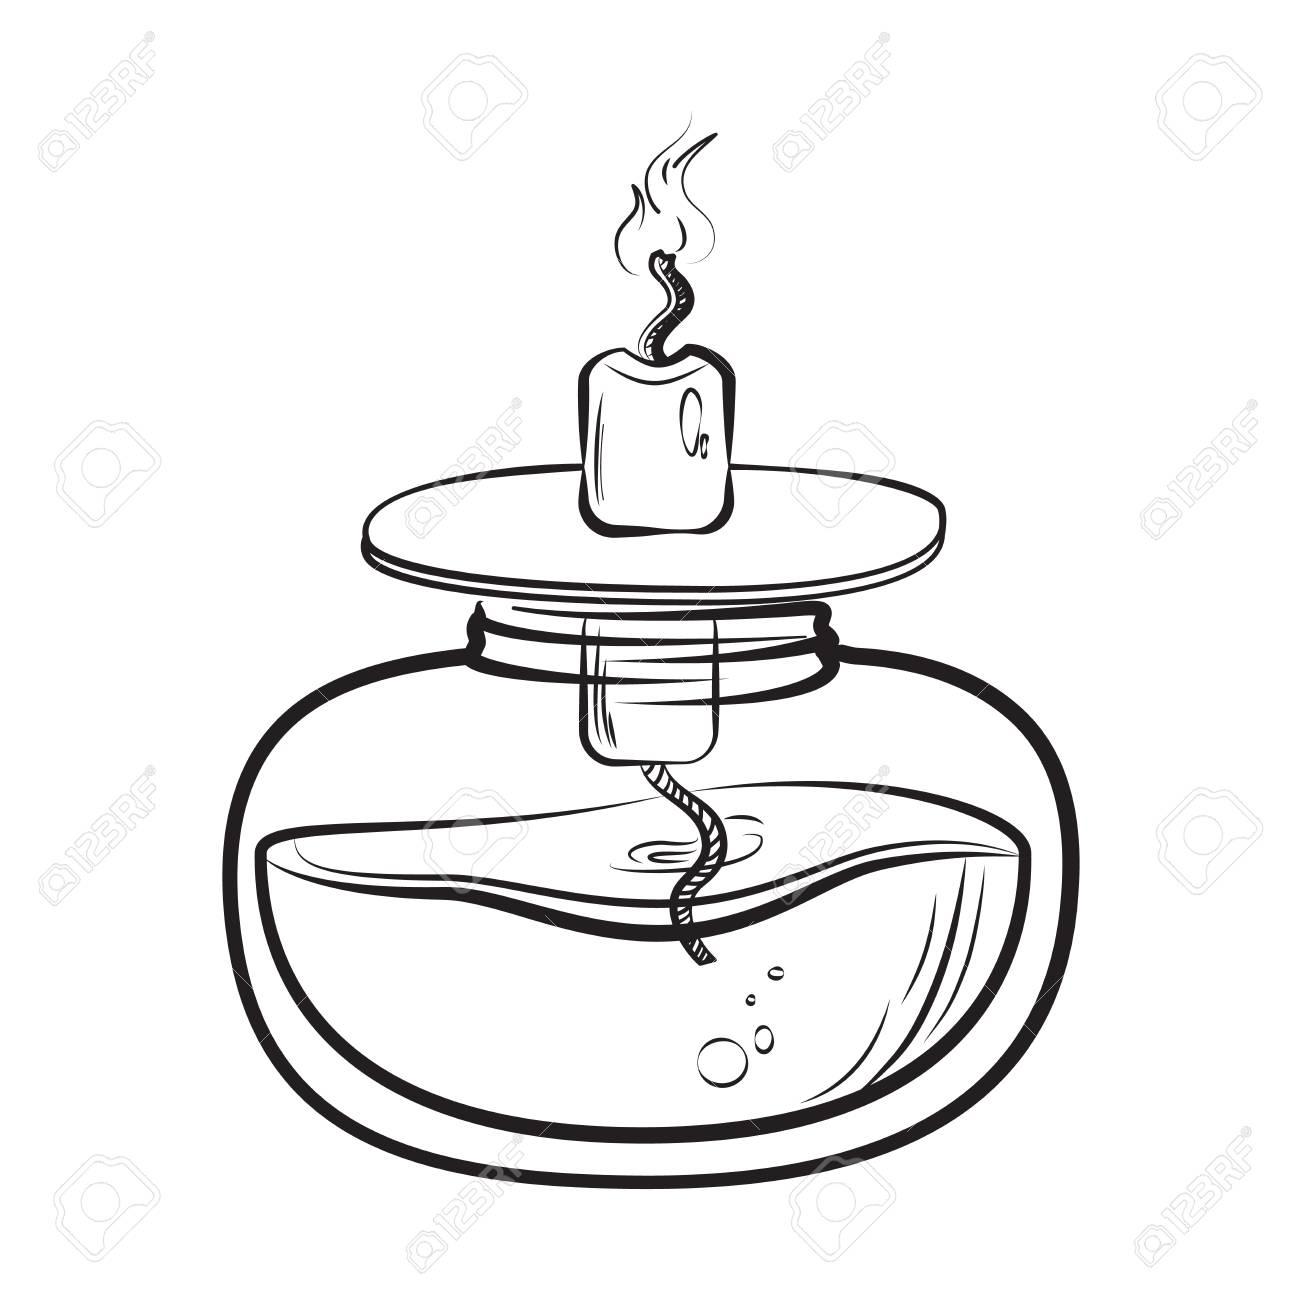 Lamp Drawing At Getdrawings